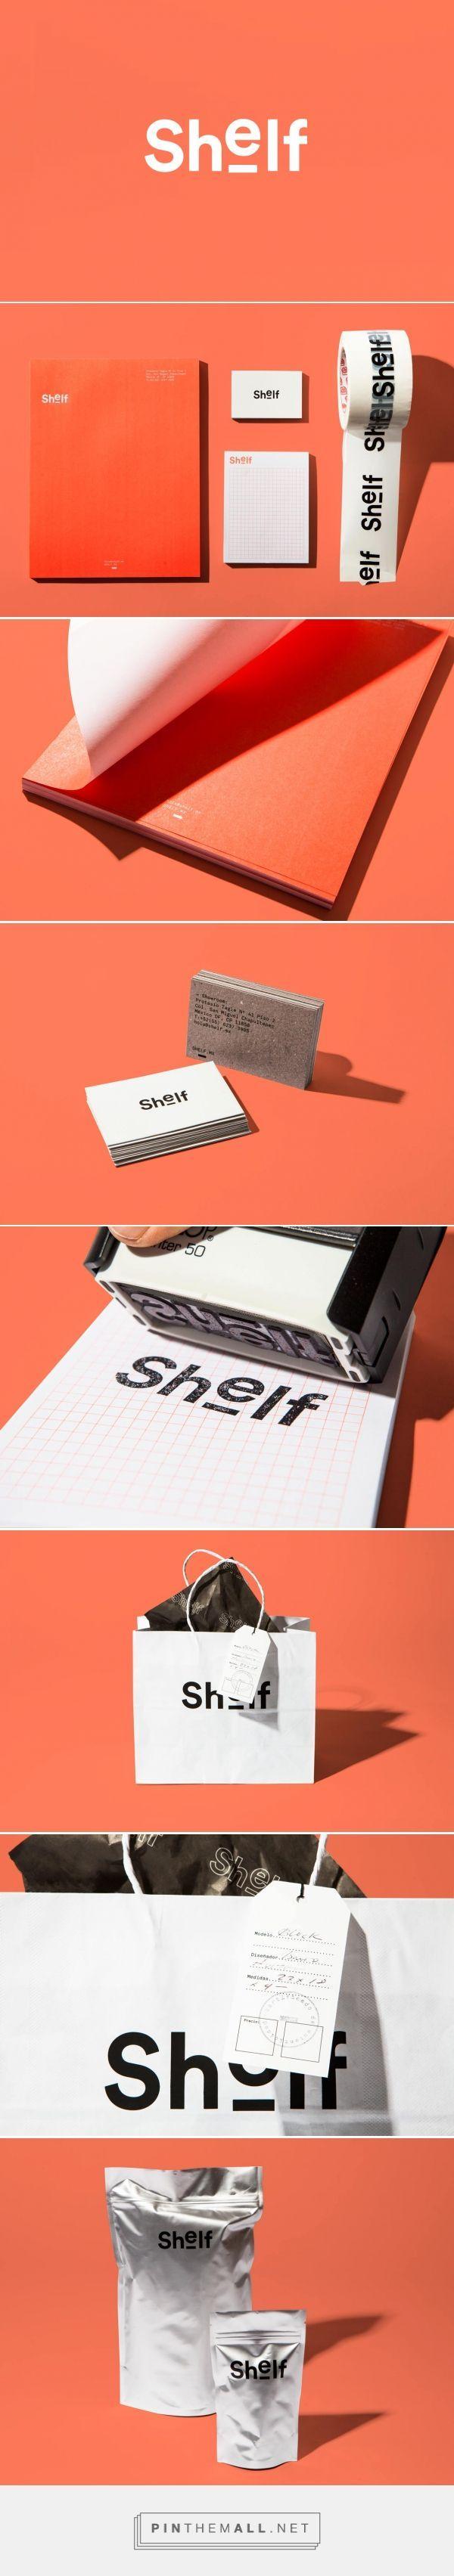 Shelf Branding by Sociedad Anonima   Fivestar Branding – Design and Branding Agency & Inspiration Gallery